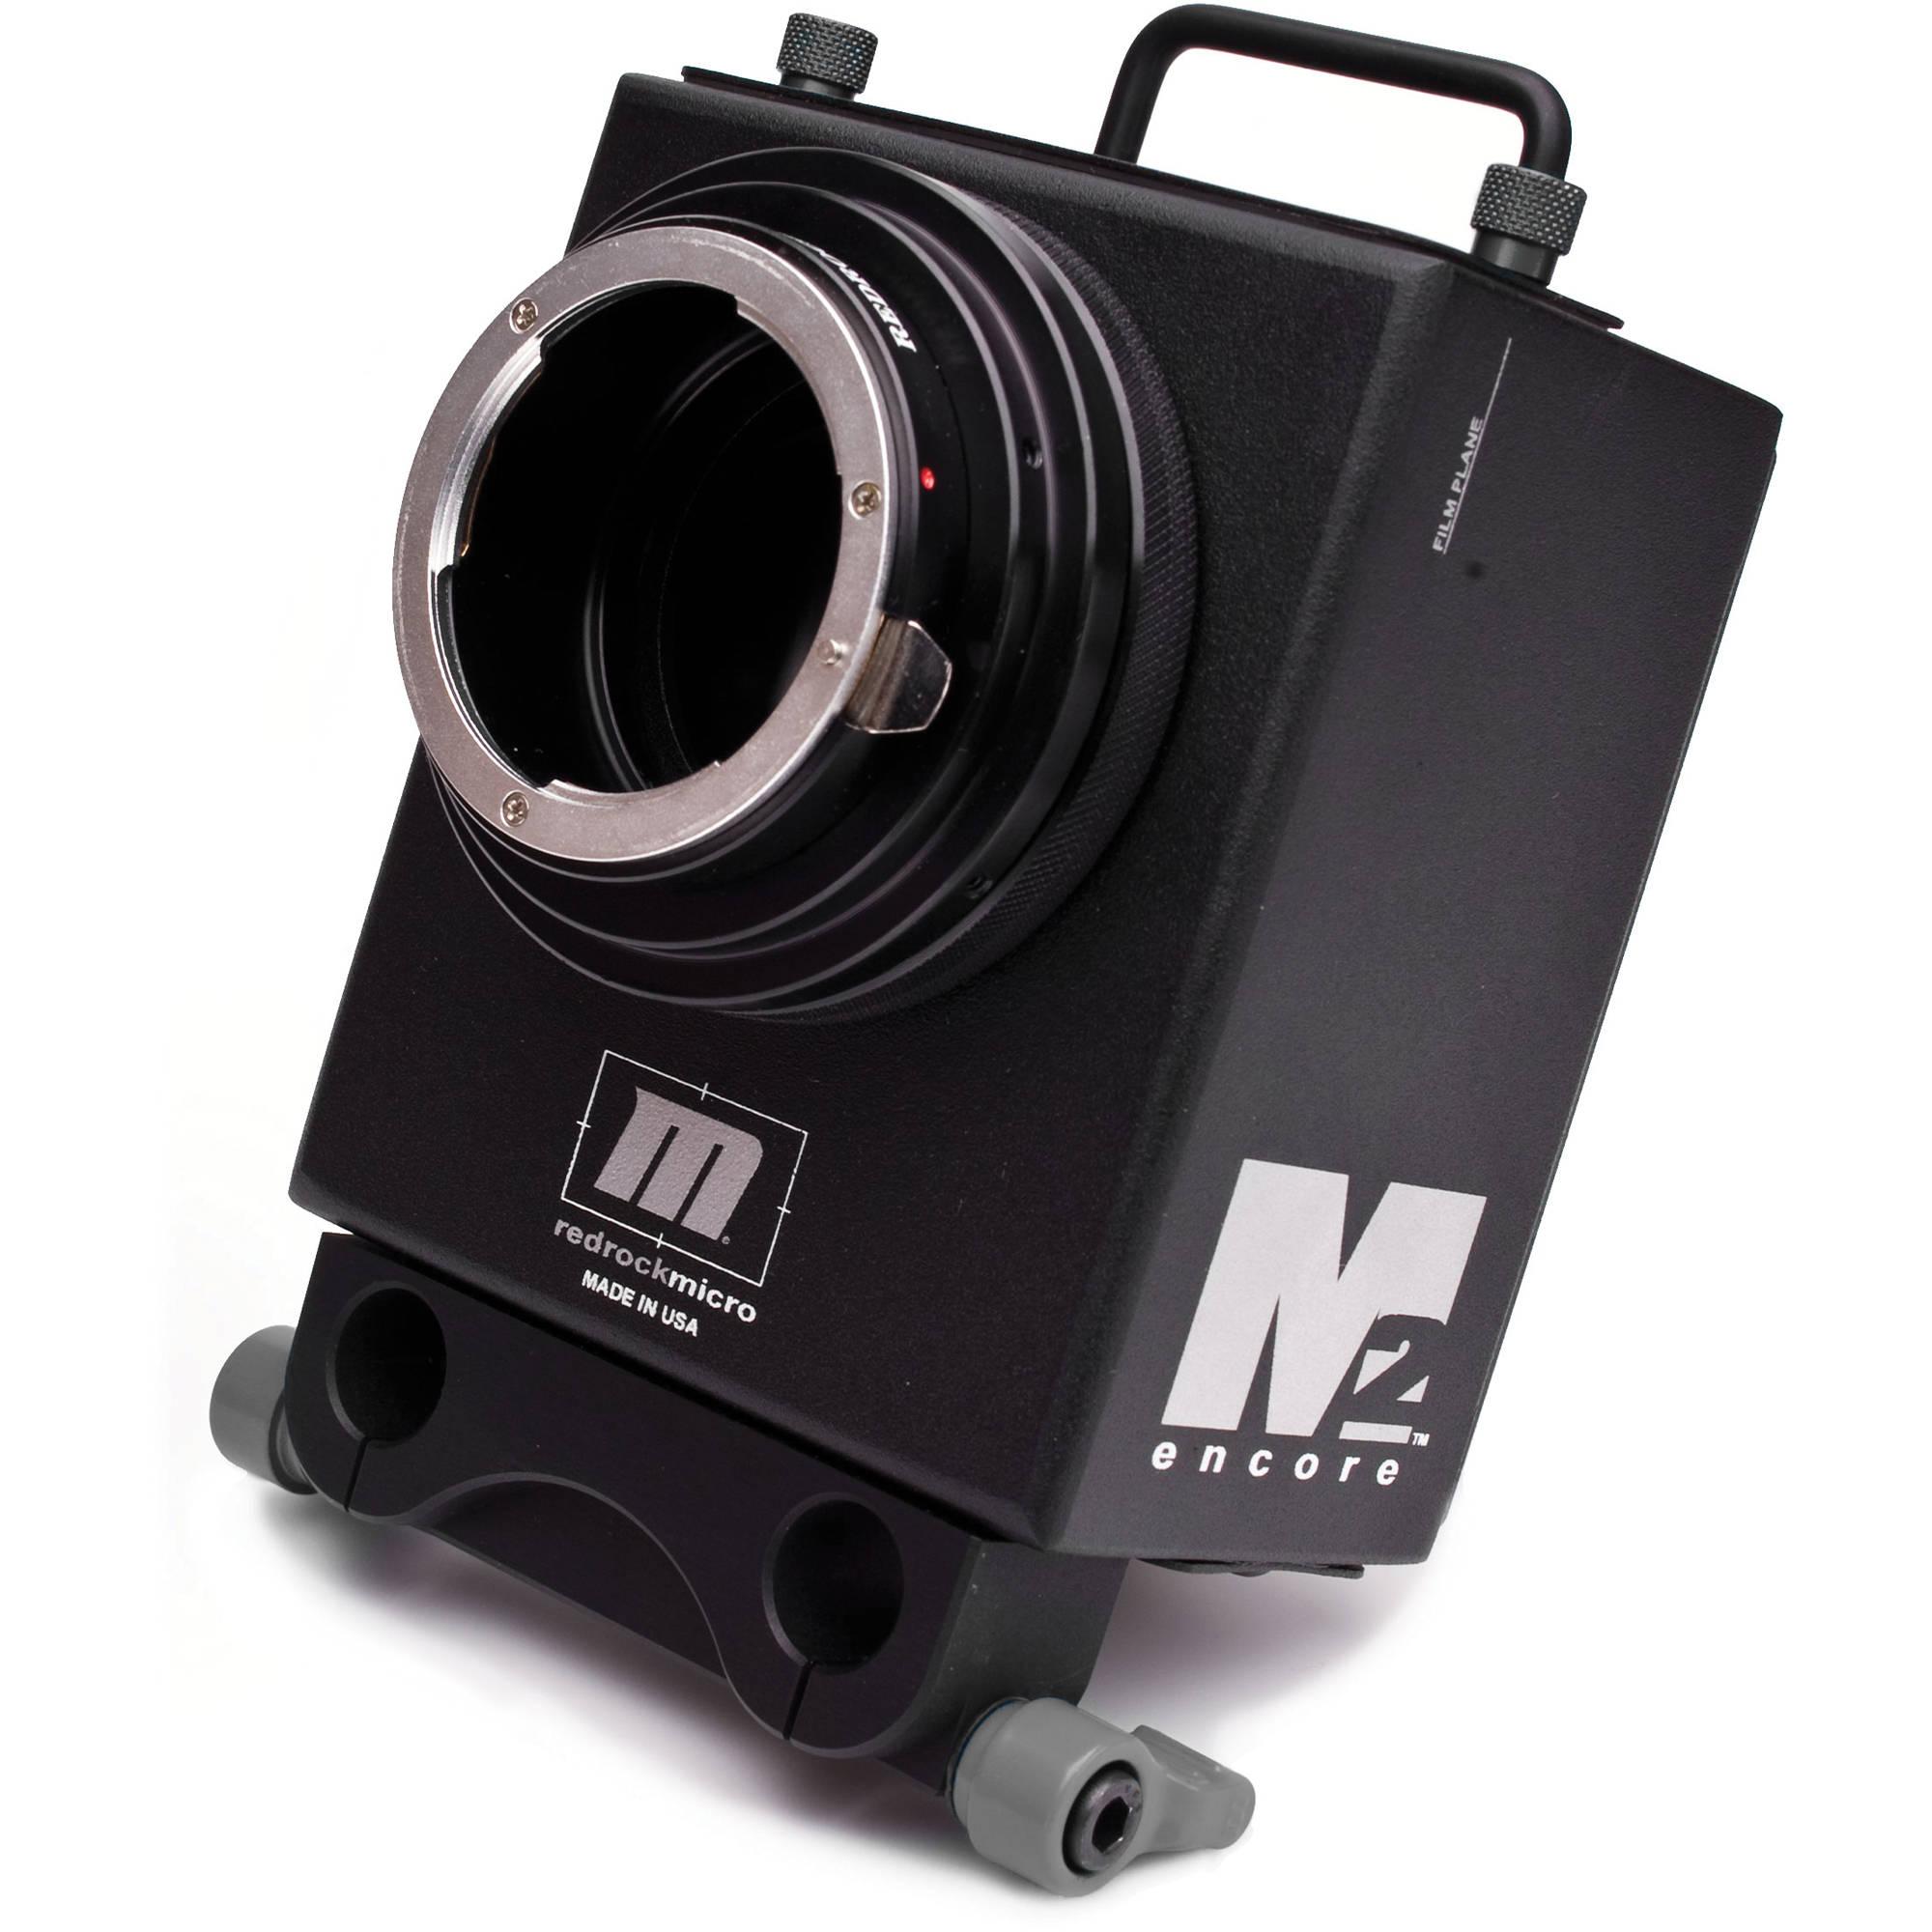 Redrock Micro M2 Encore Cinema Lens Adapter 3-034-0001CE B&H